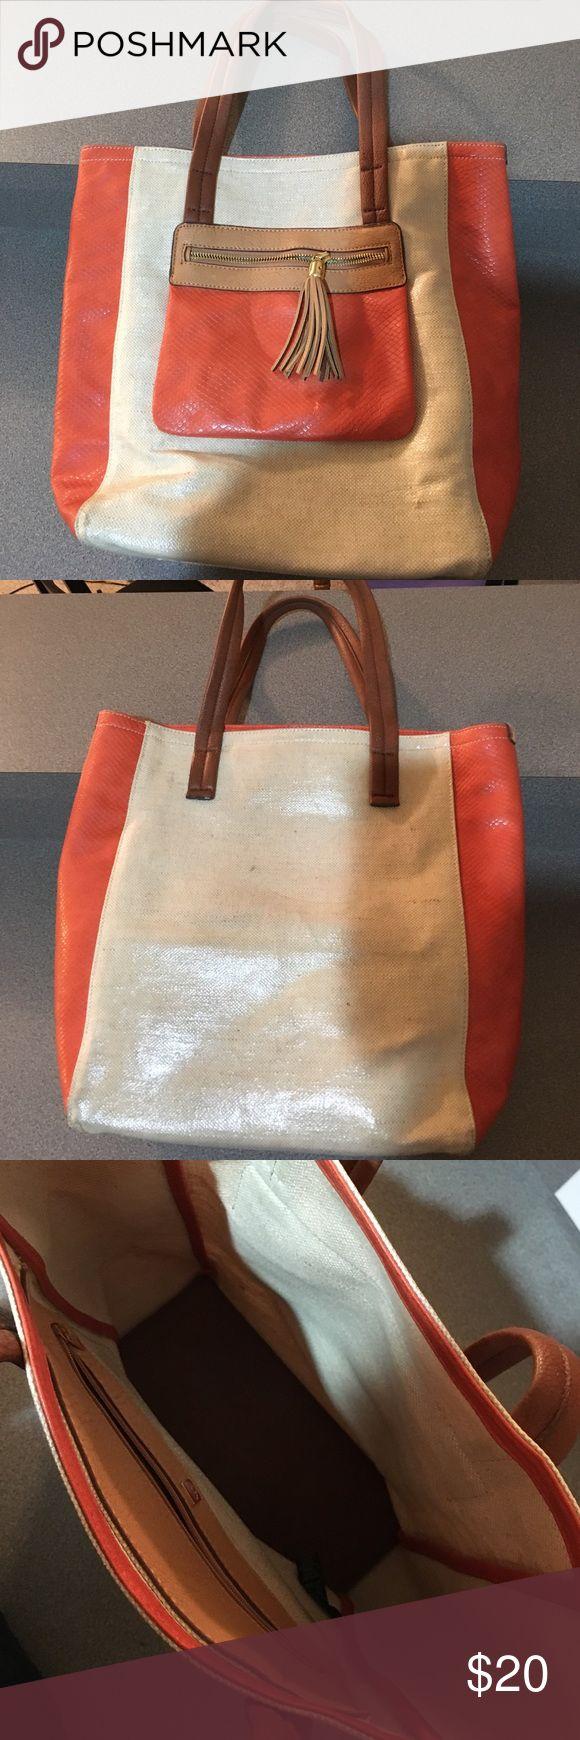 Orange and cream shoulder bag Perfect shoulder bag for work or play! Relic Bags Shoulder Bags